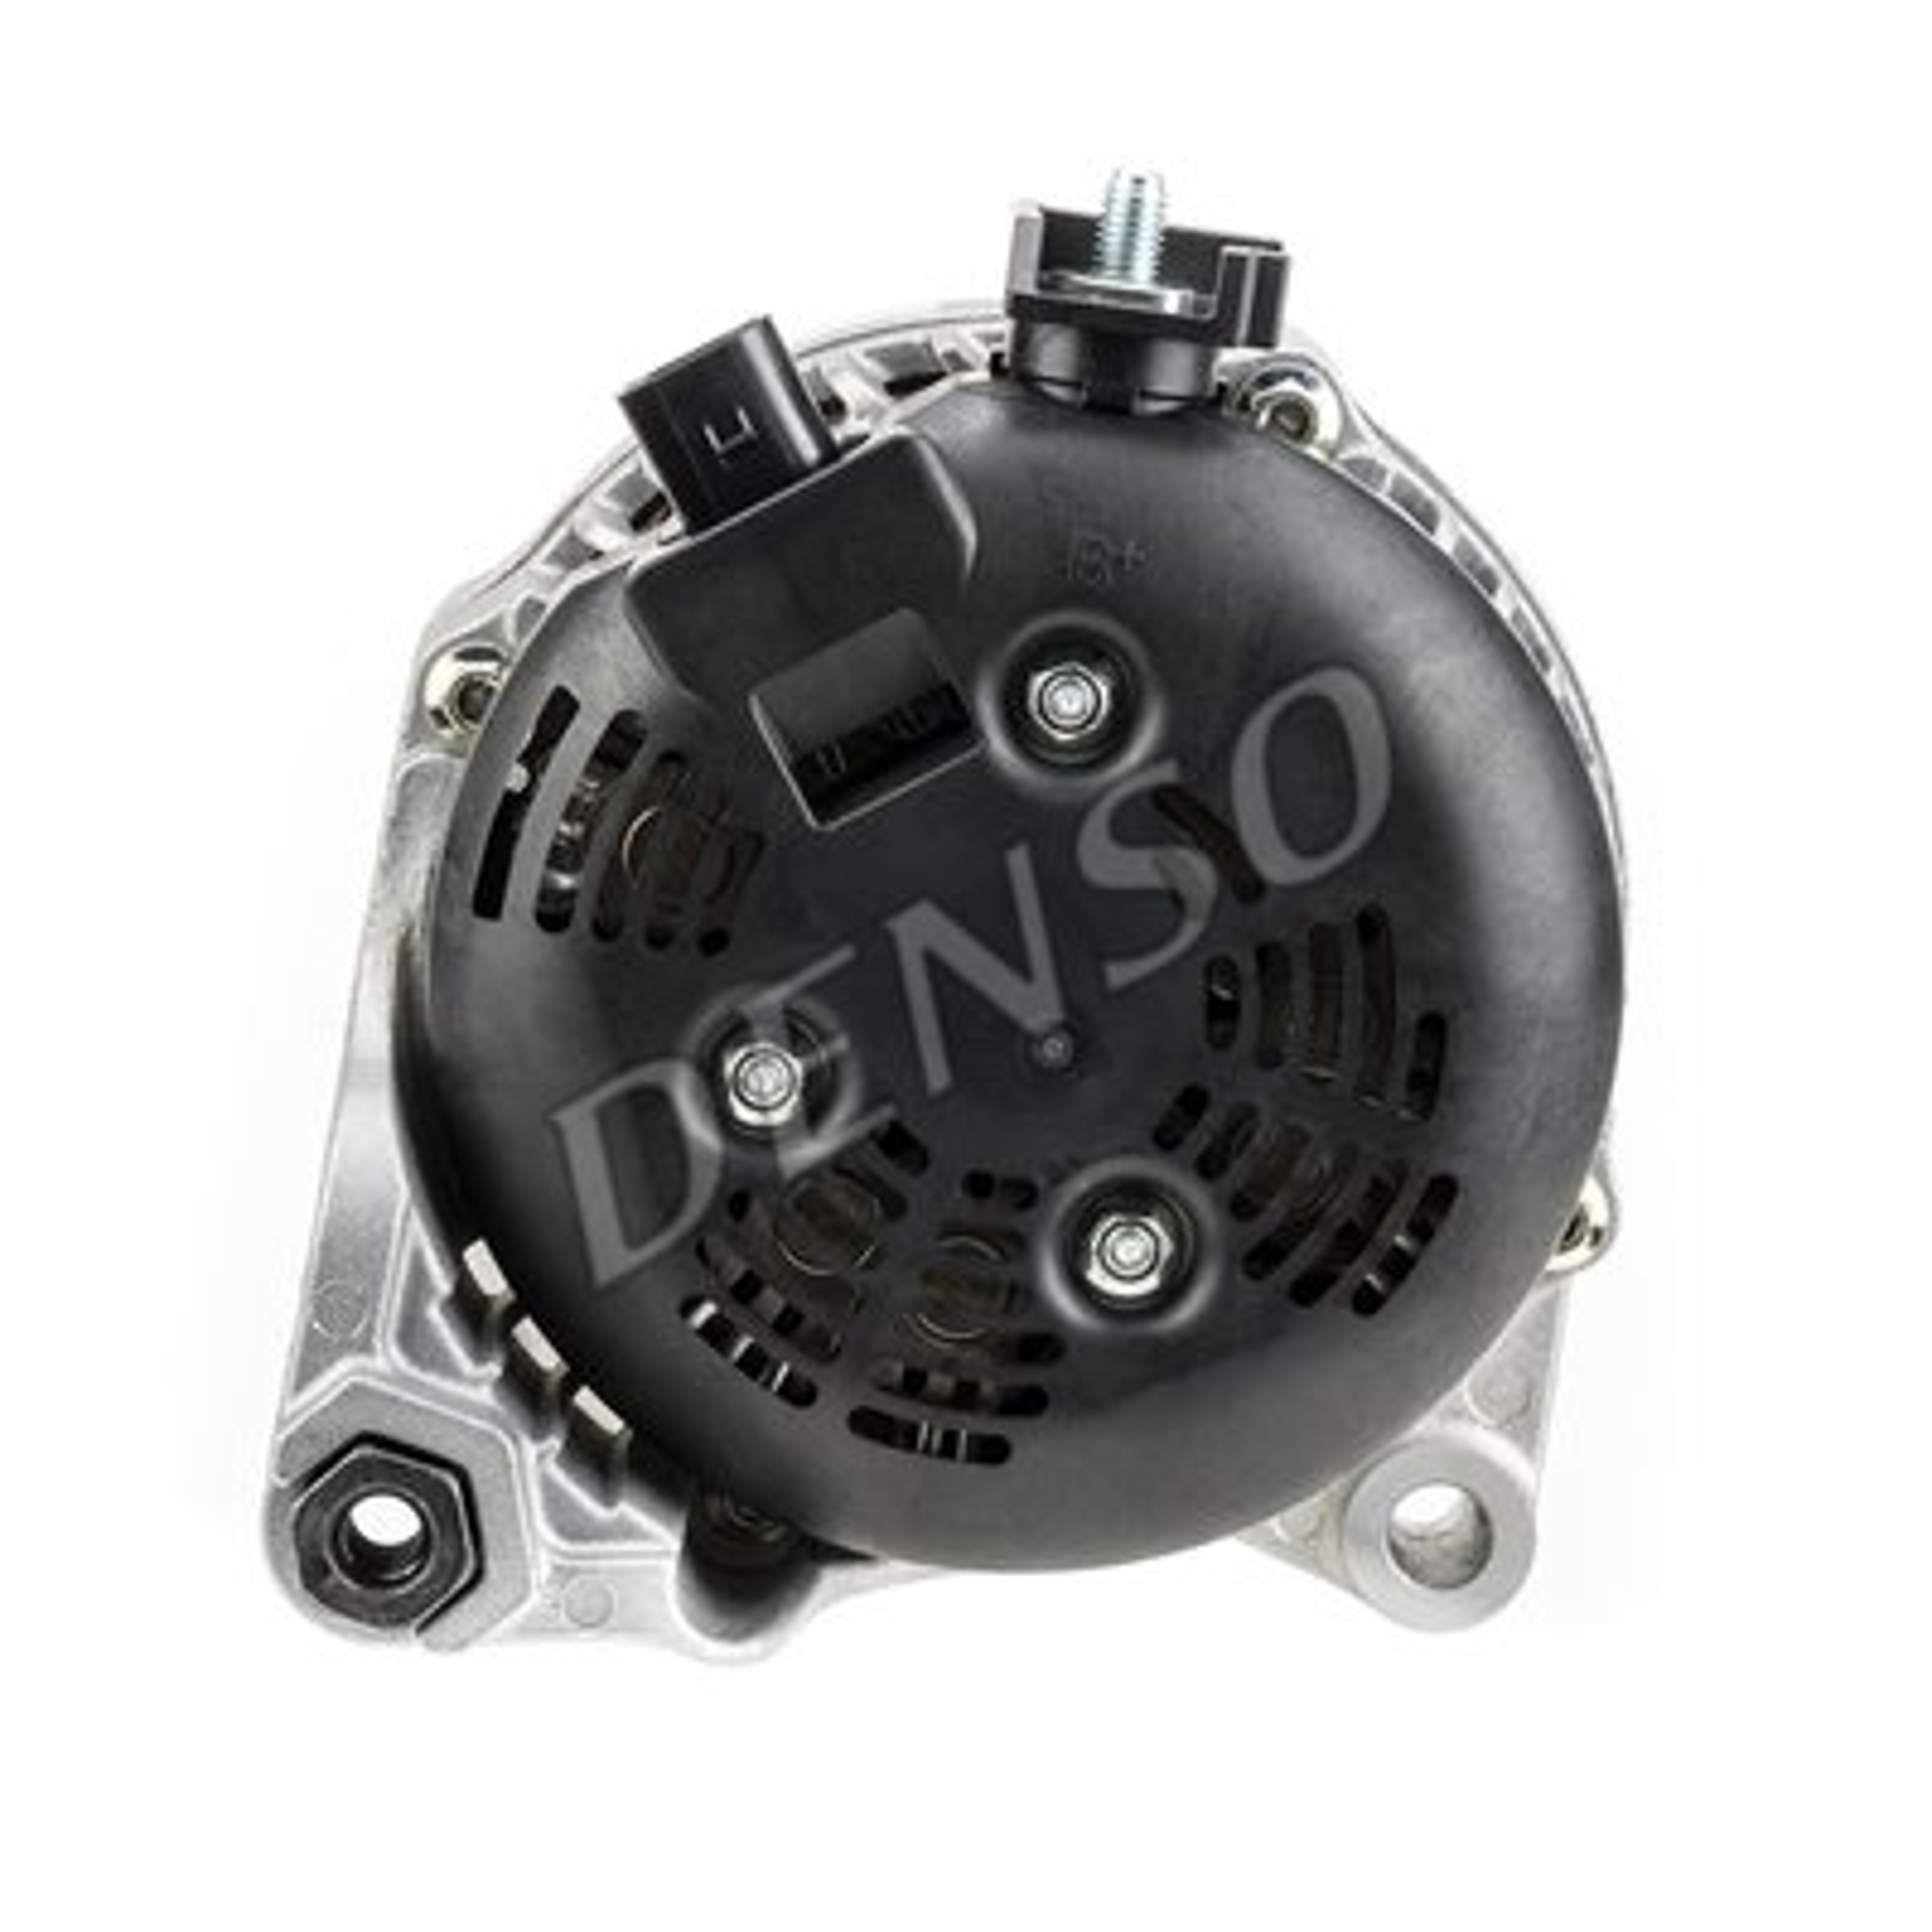 Generator DENSO DAN1464 Bild 2